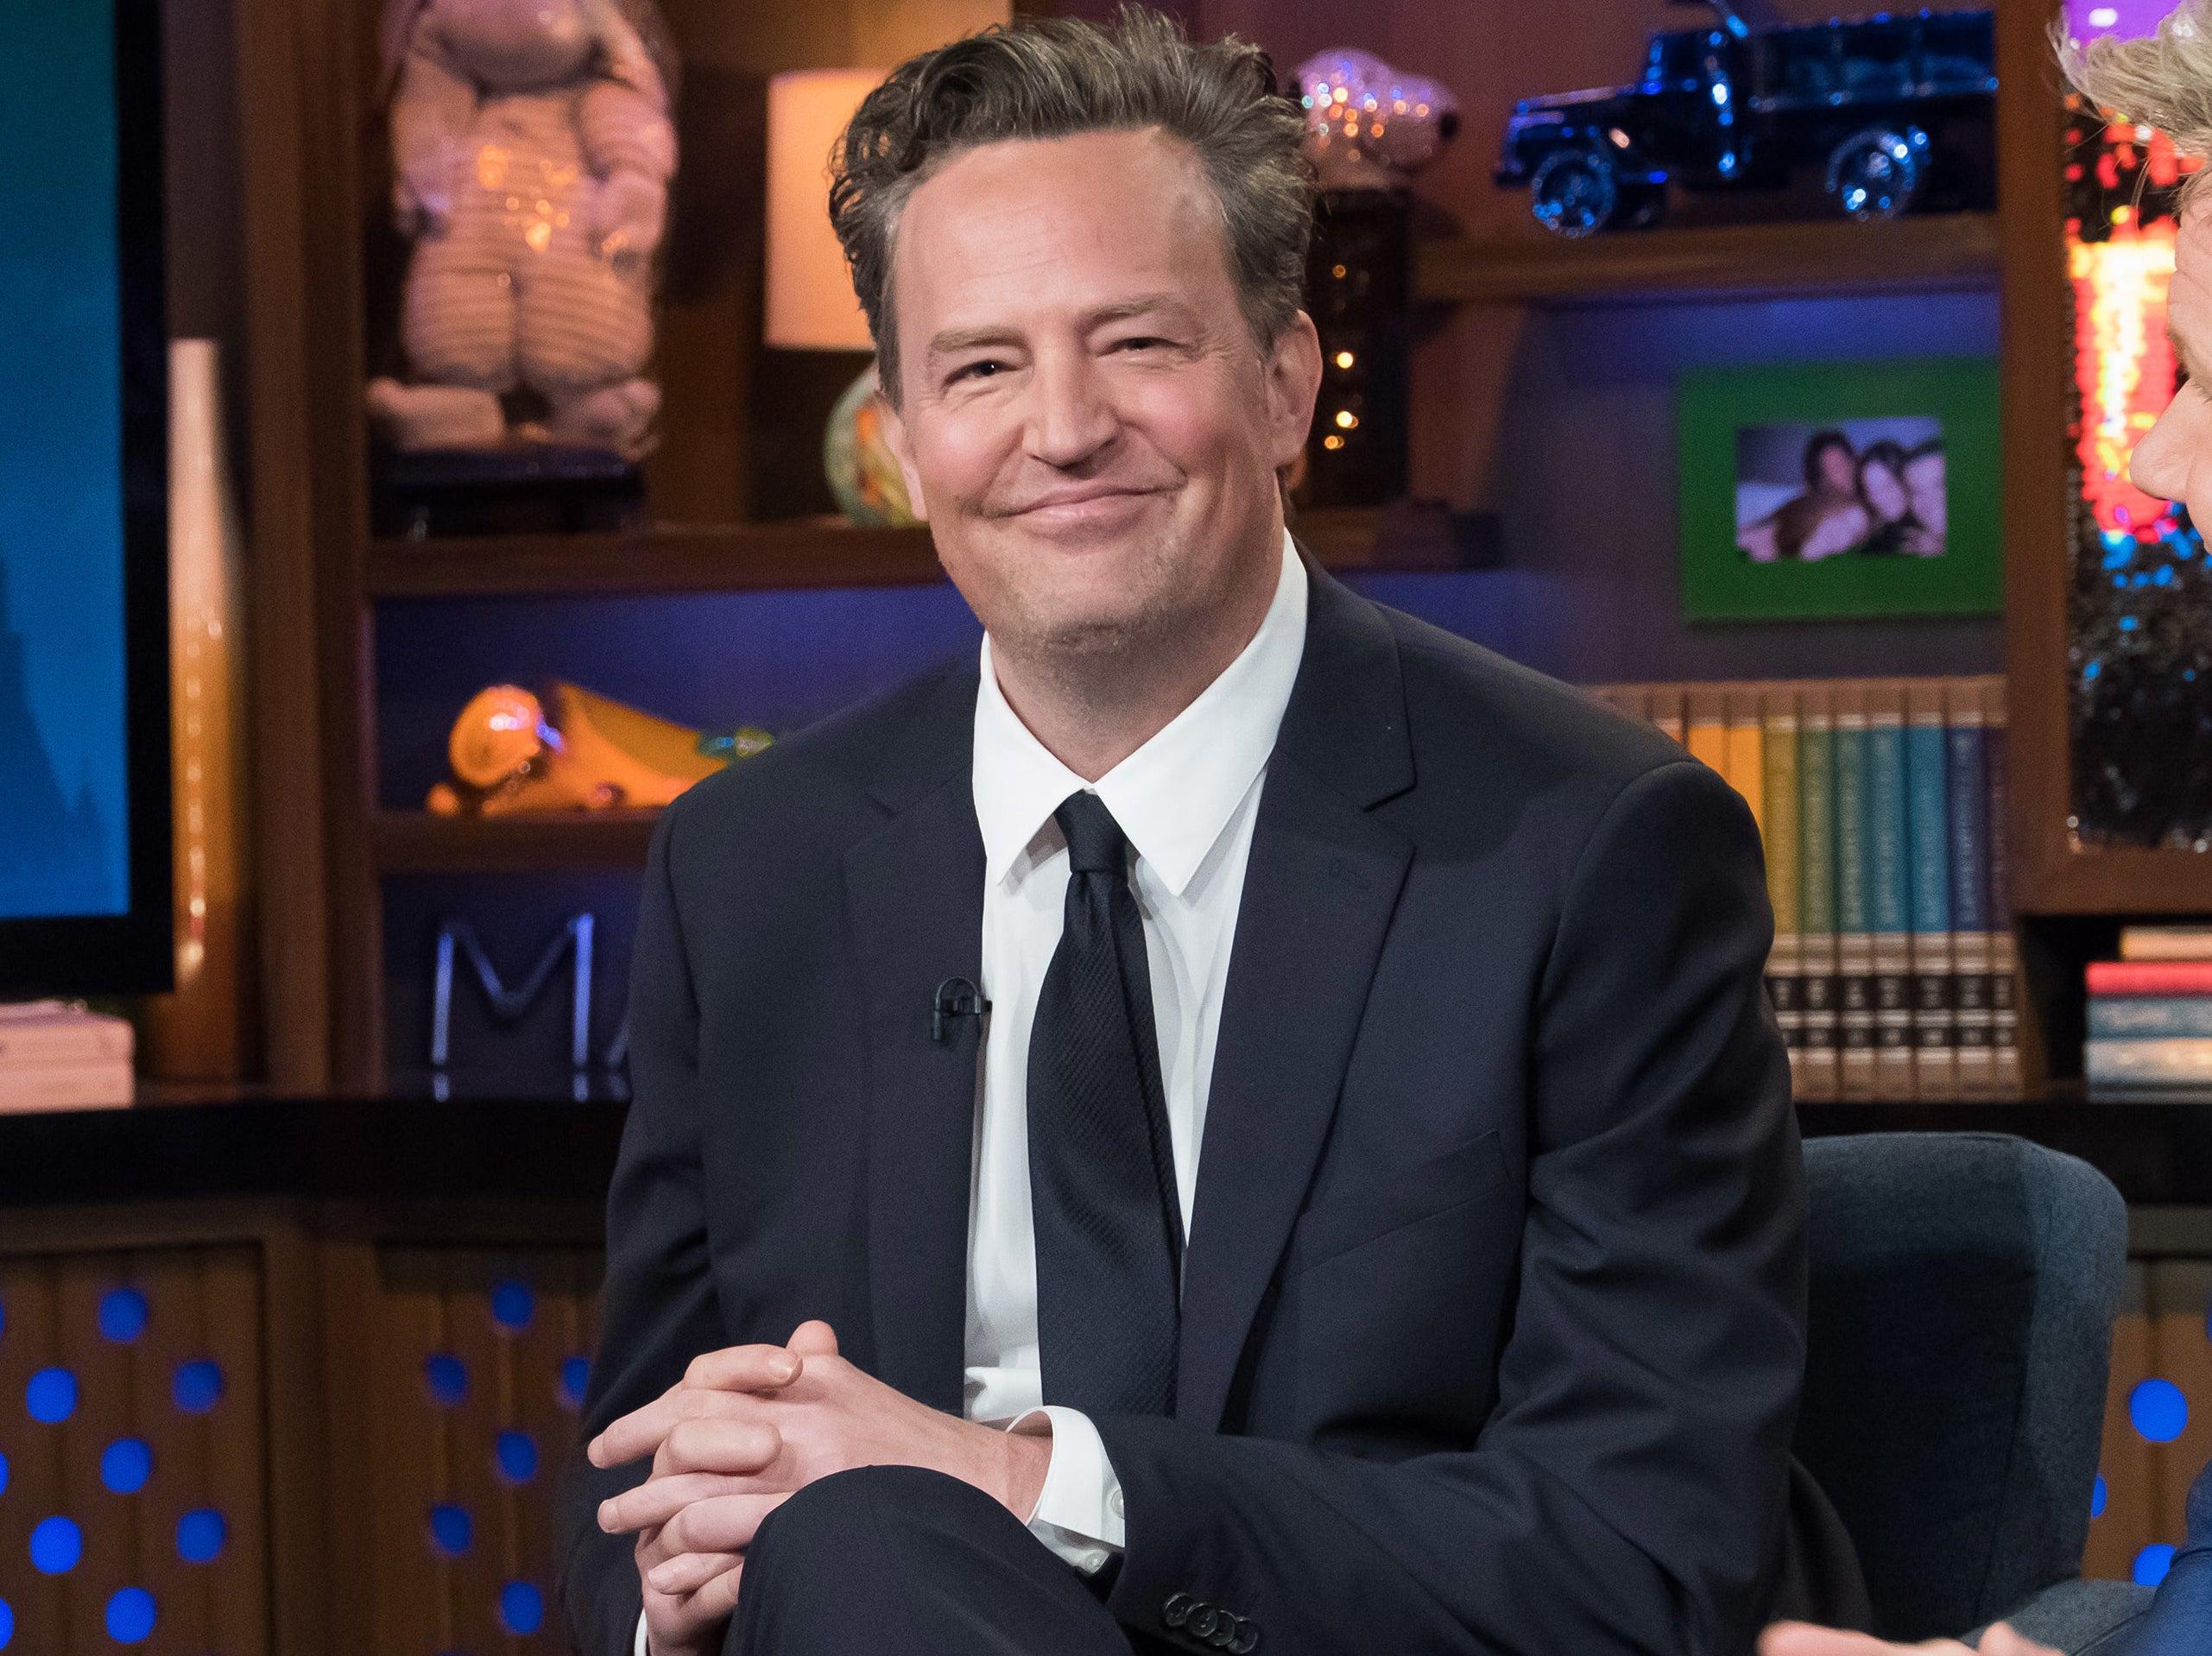 Matthew smiles during a recent interview